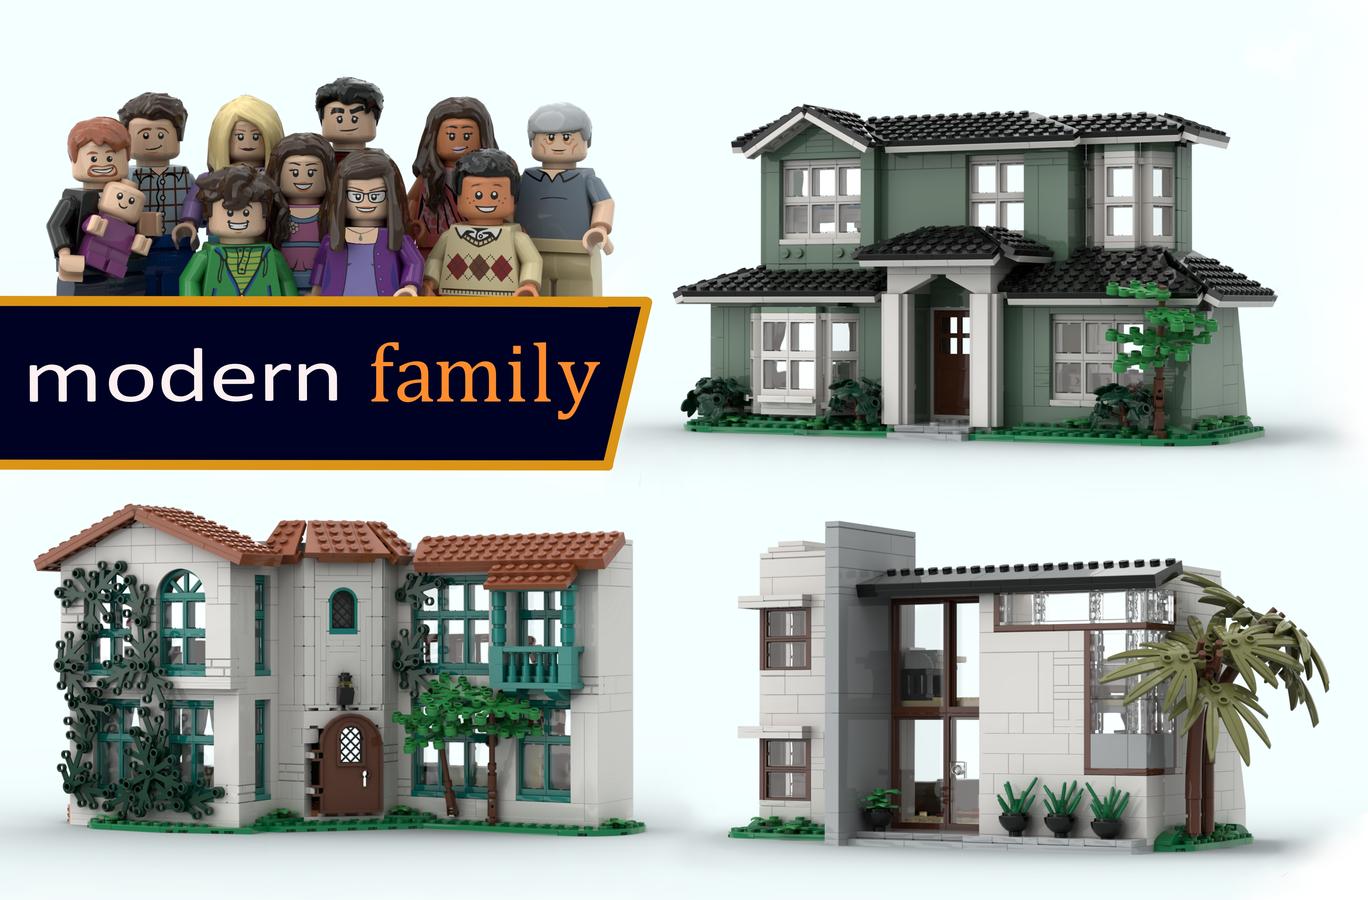 Lego Ideas Modern Family